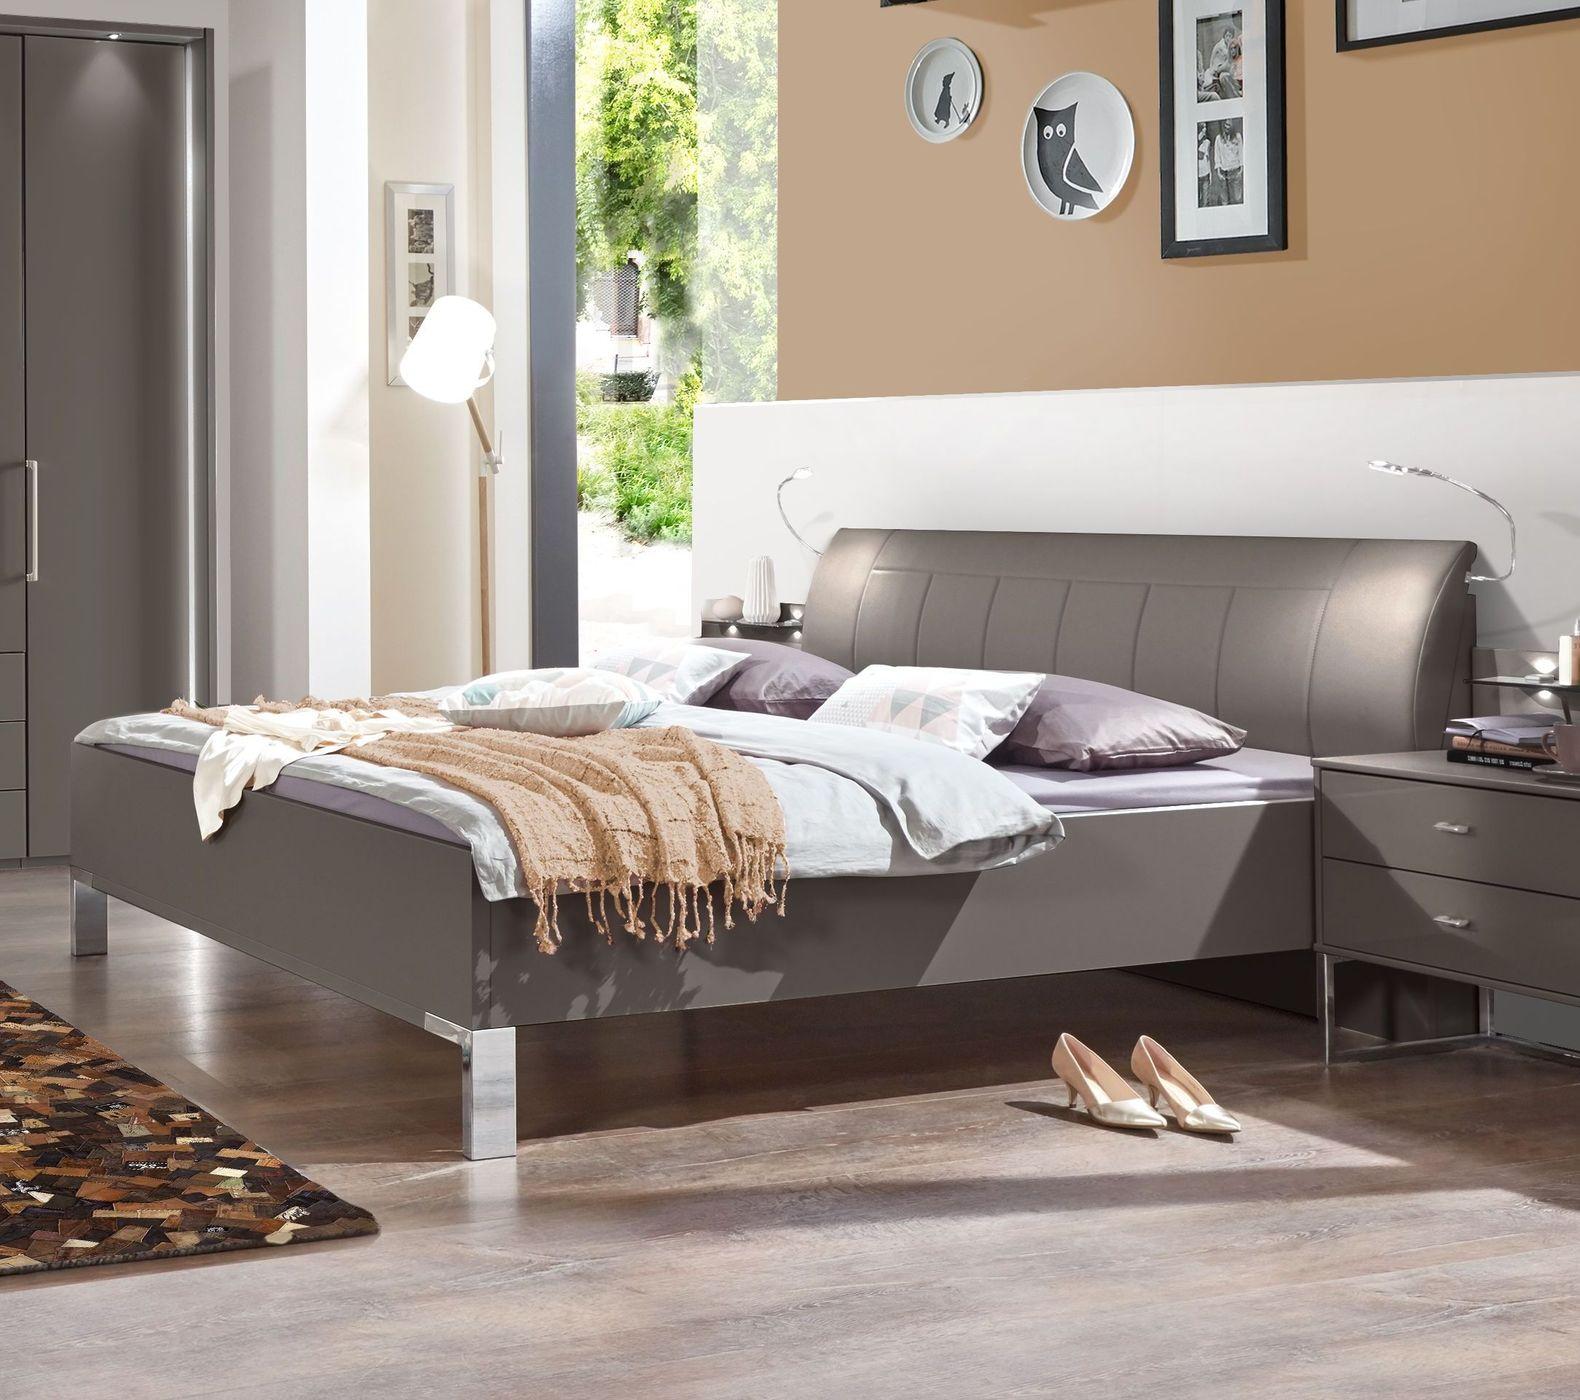 bett in komforth he mit kunstleder kopfteil in havanna harrow. Black Bedroom Furniture Sets. Home Design Ideas